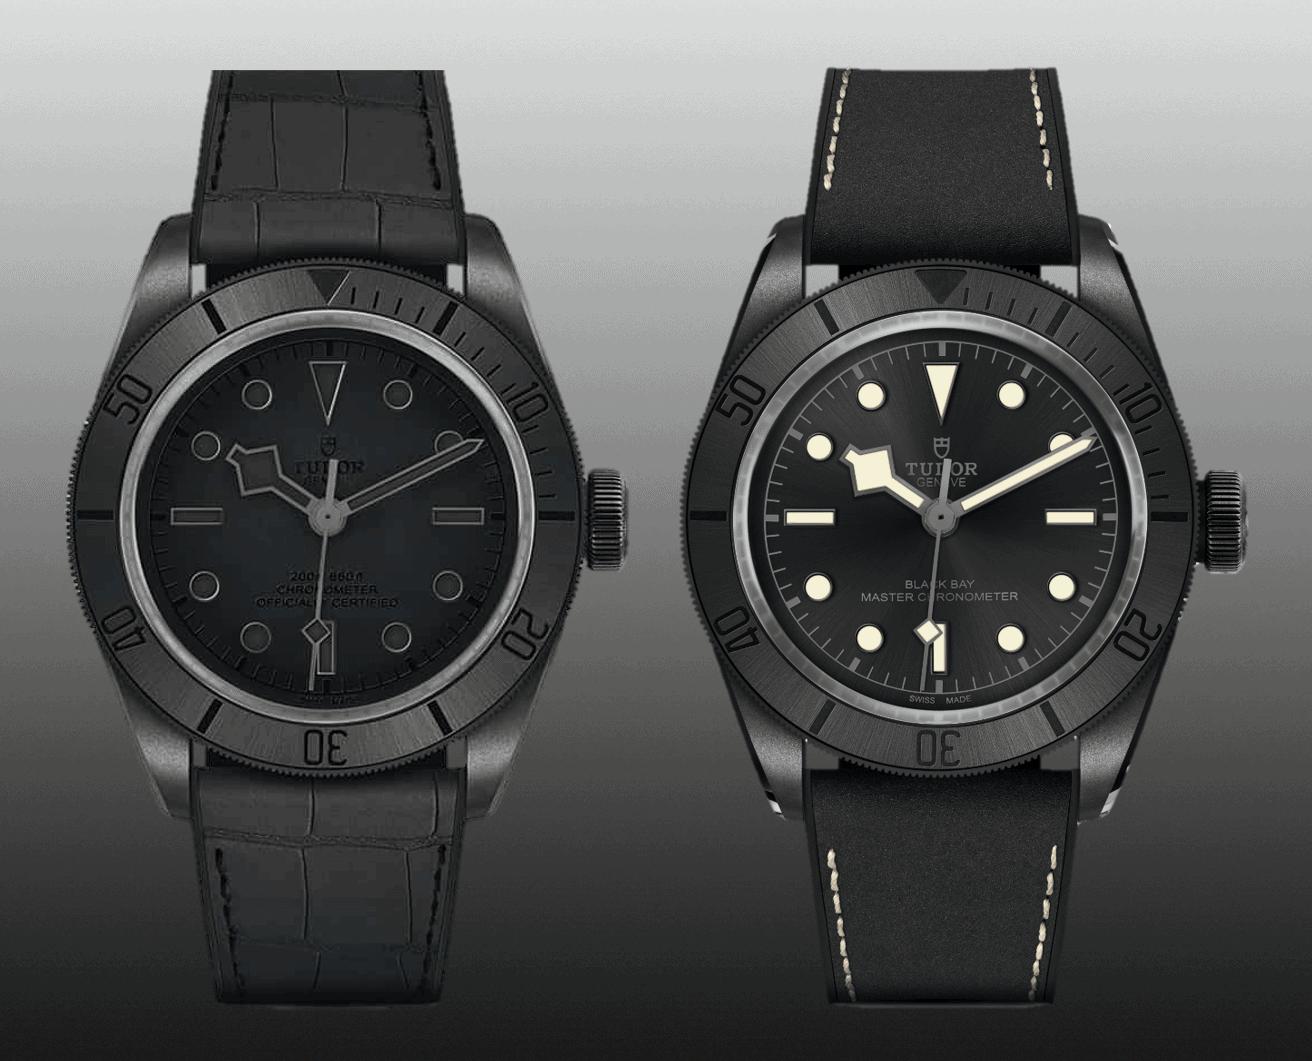 Tudor Black Bay Ceramic One 2019 Only Watch & Tudor Black Bay Ceramic Master Chronometer von 2021